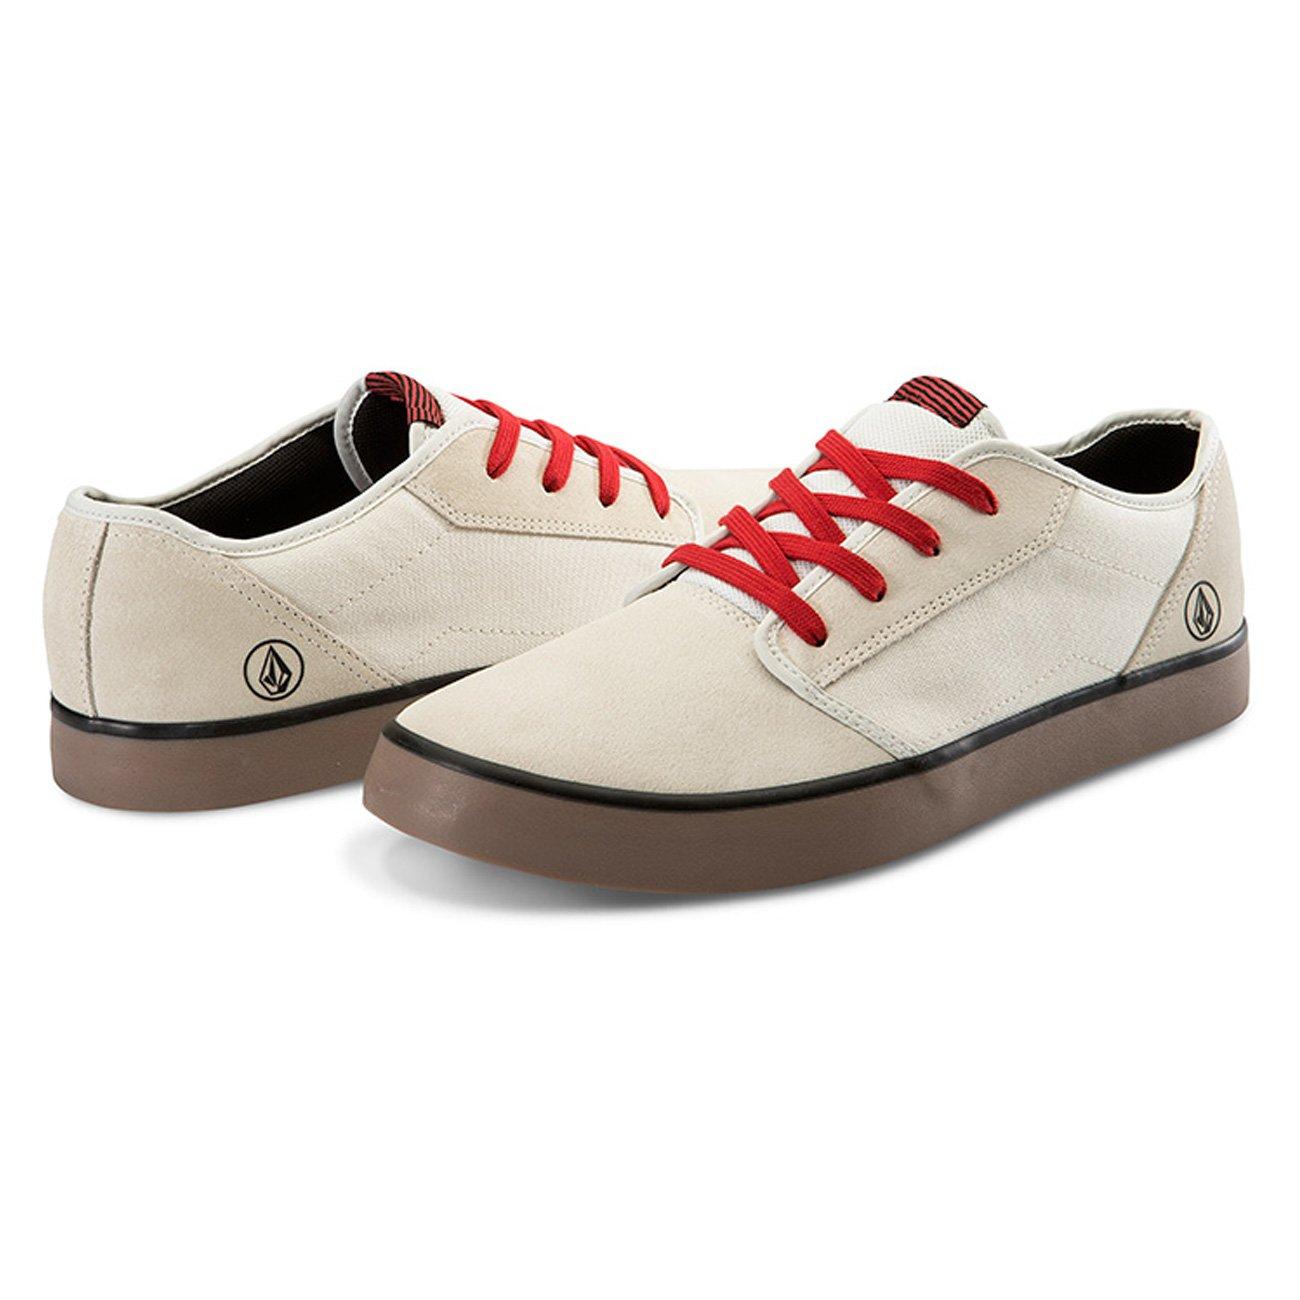 Chaussures de Skateboard Homme Volcom Grimm 2 Shoe